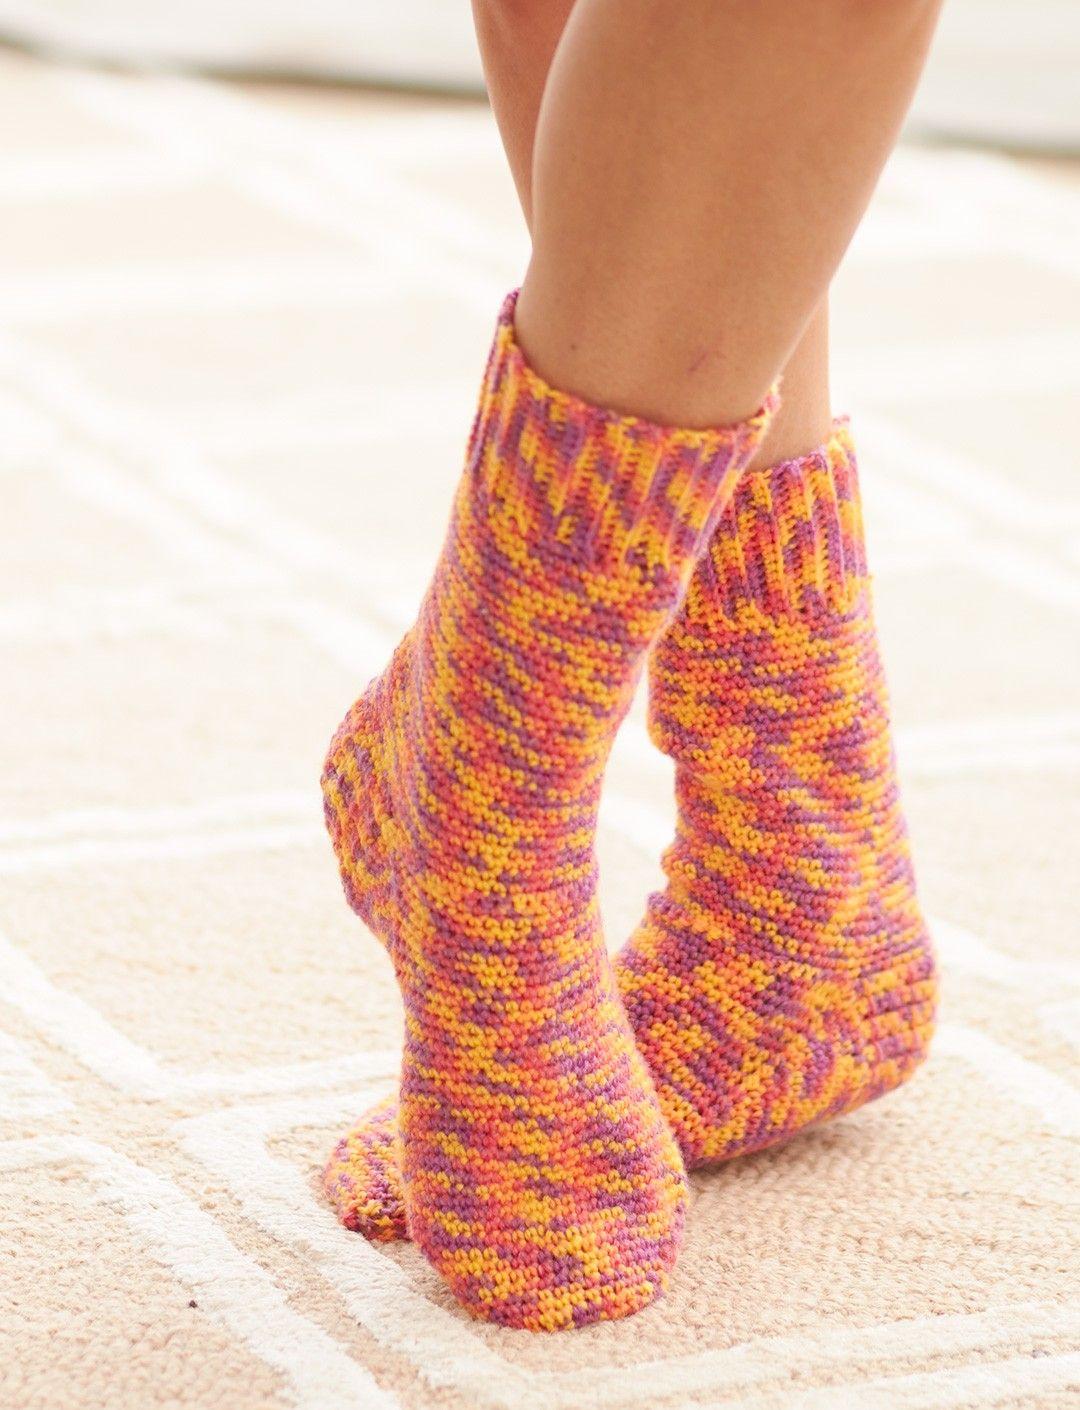 Basic Socks - free pattern - crochet | Crochet Stitches | Pinterest ...